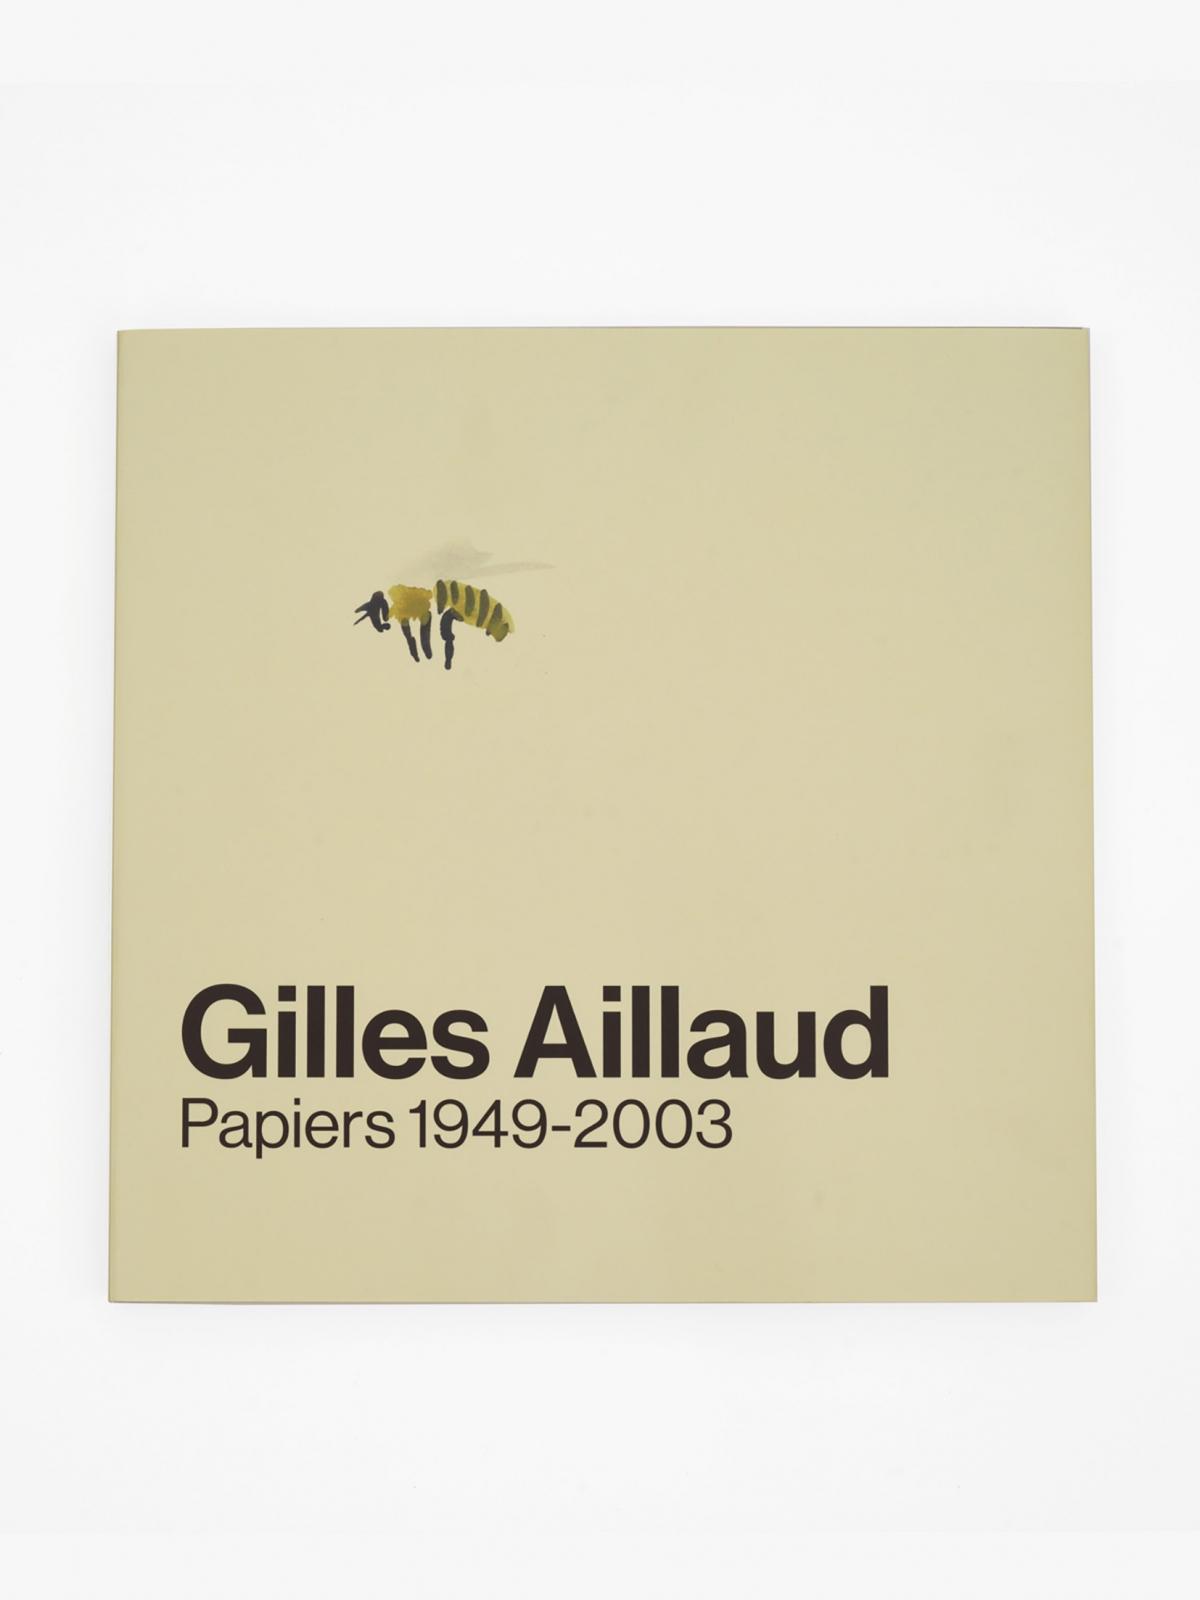 Papiers, 1949-2003